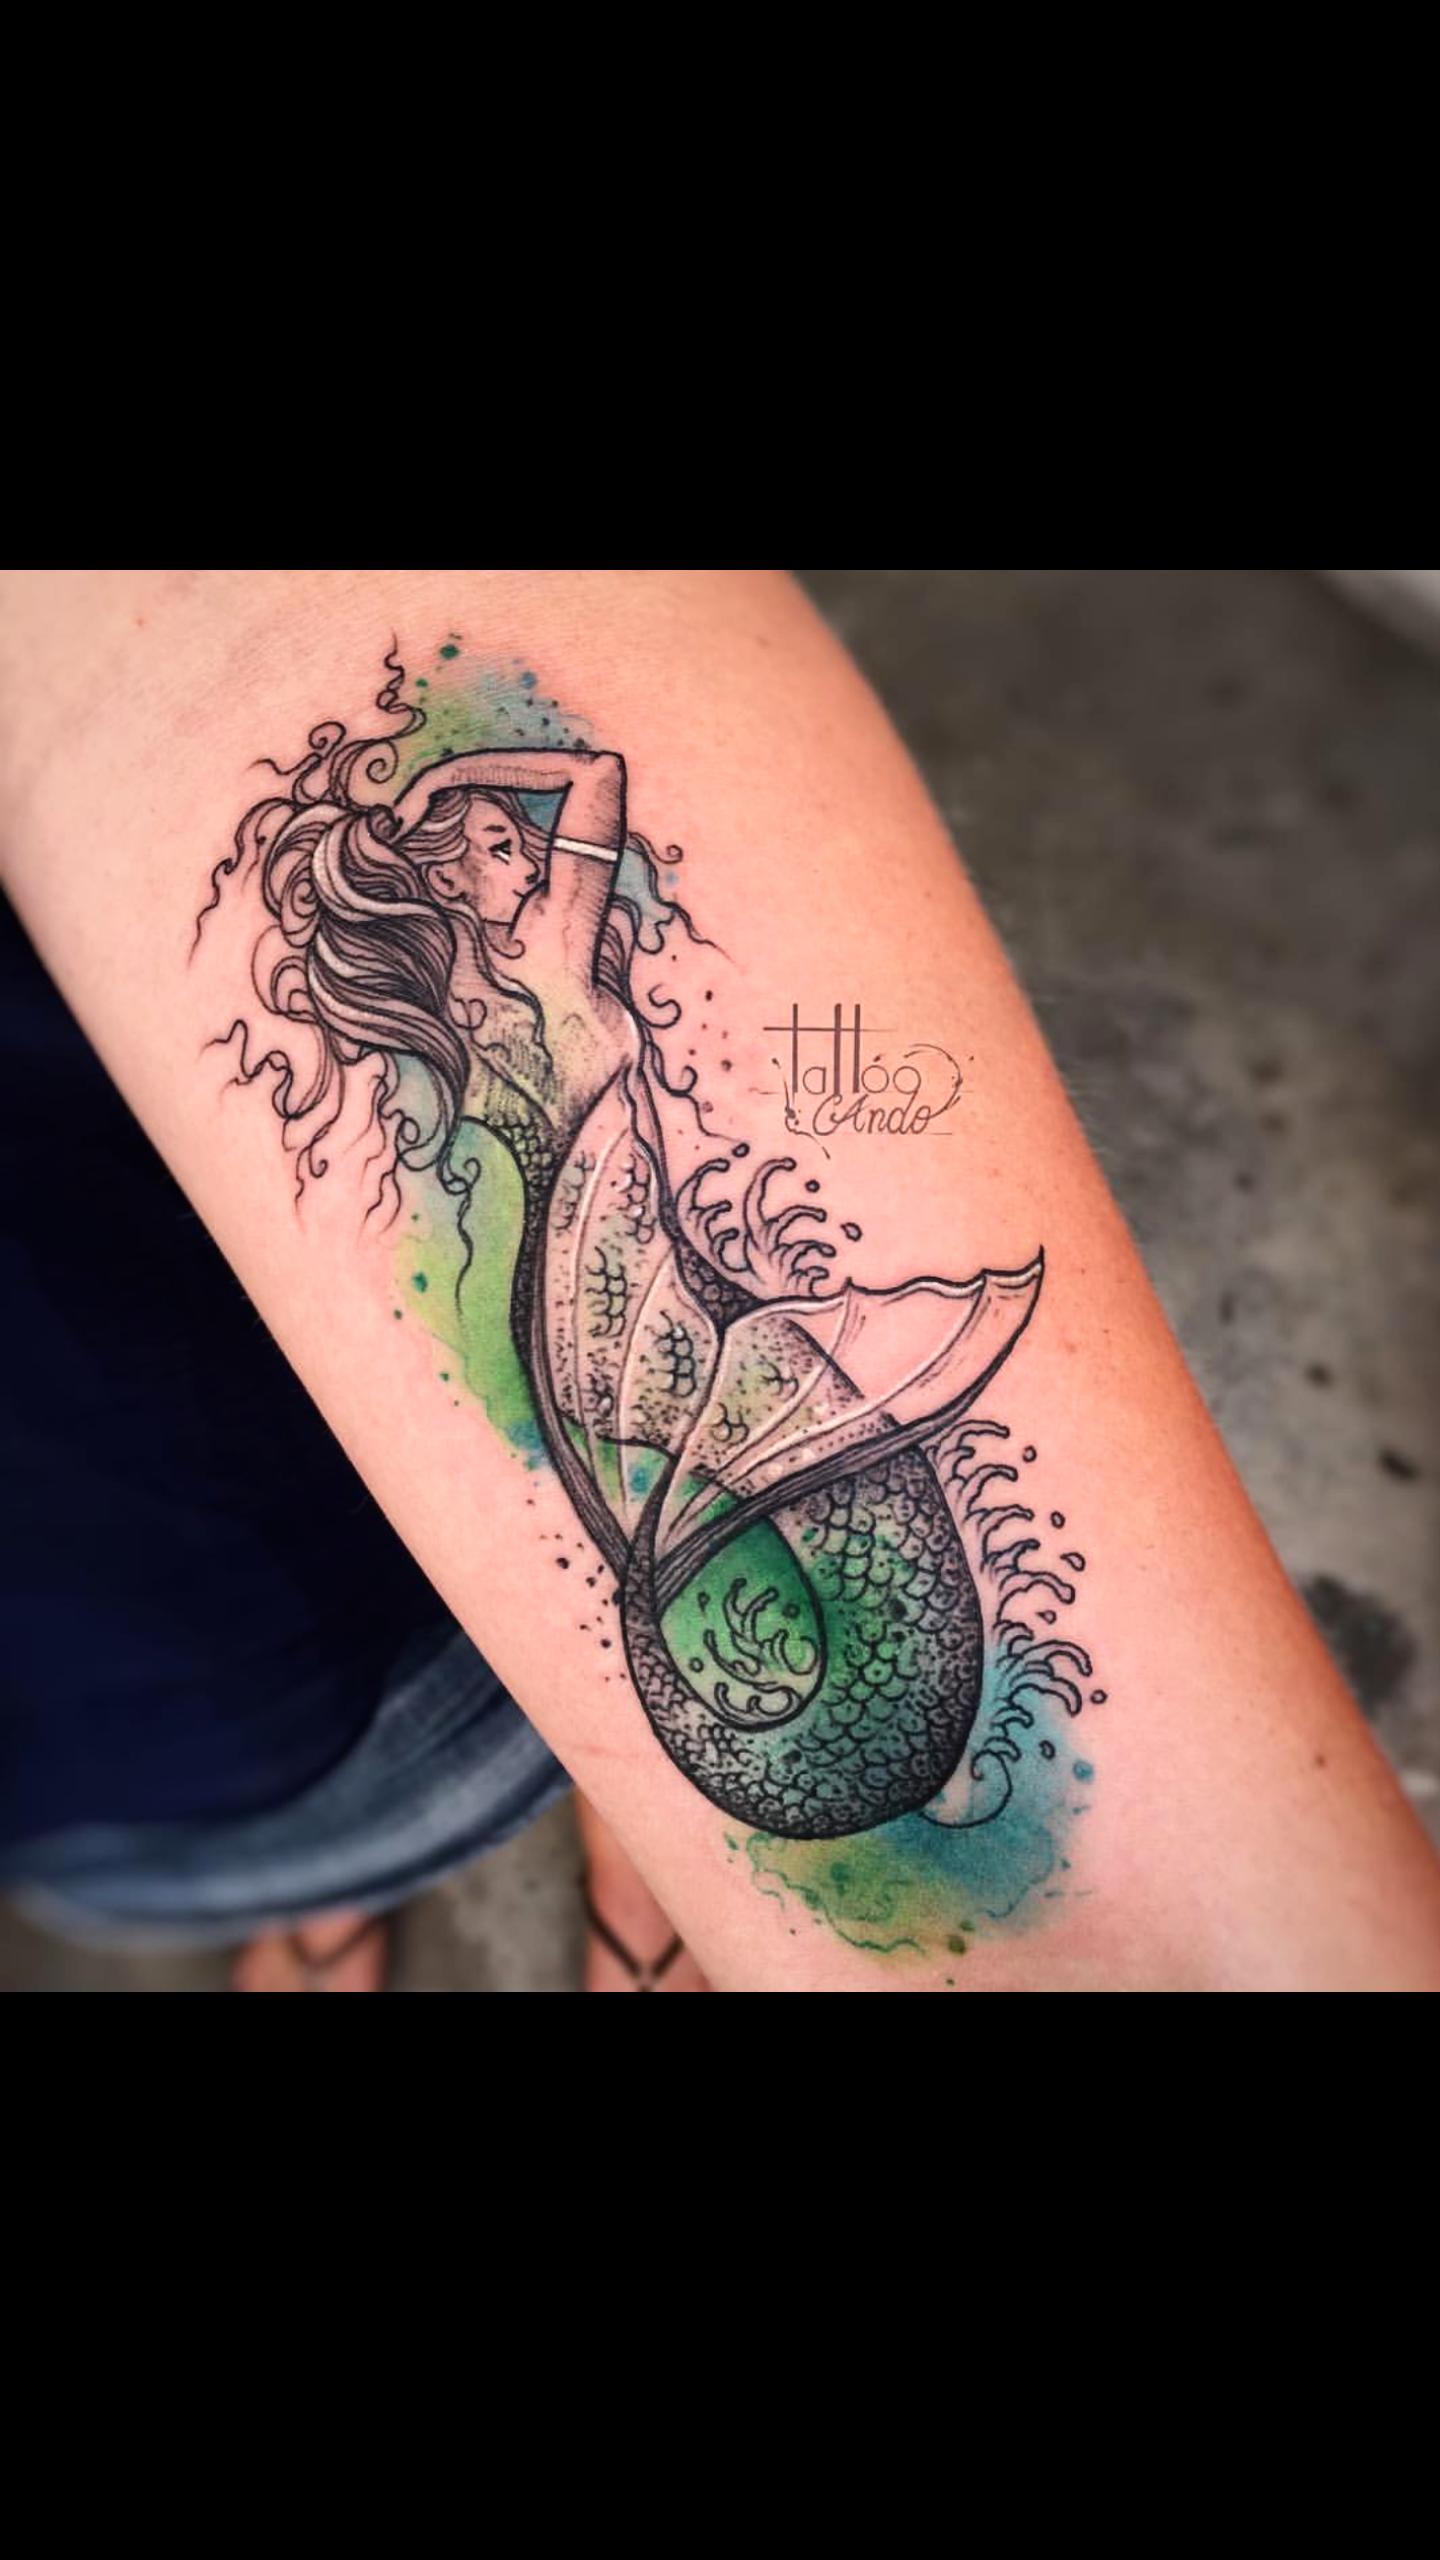 Mermaid Tattoo - Watercolor